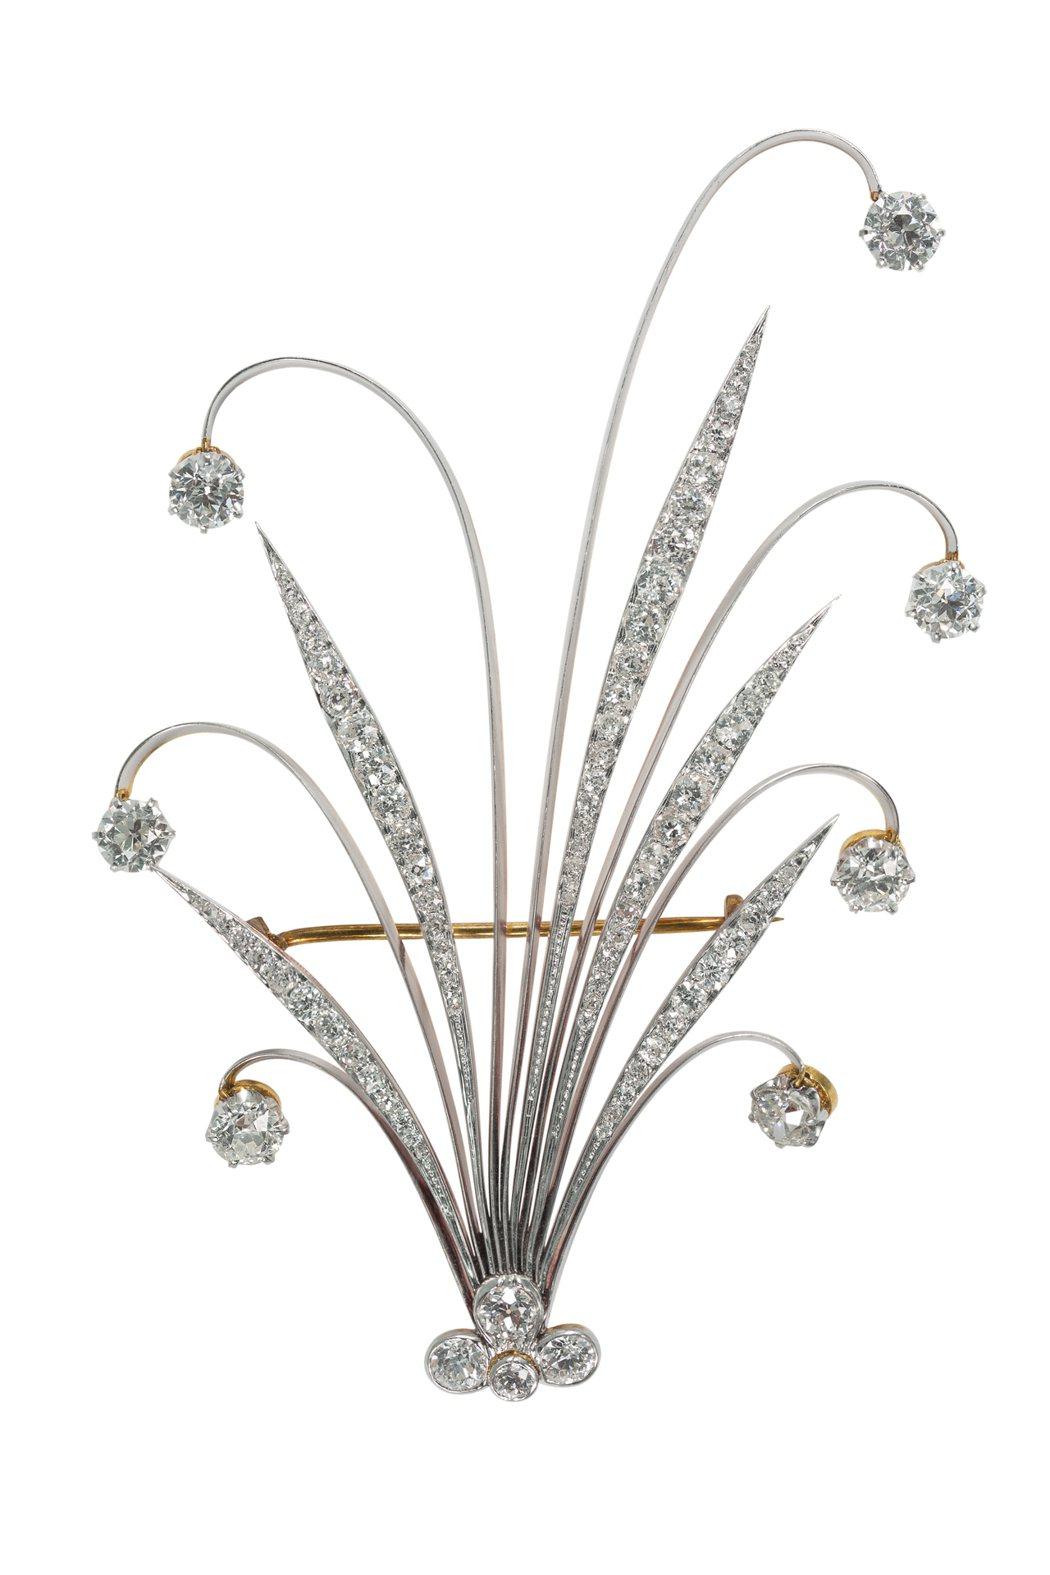 Tiffany 羽飾  (1890 - 1900),材質為黃金、鉑金與鑽石,19...